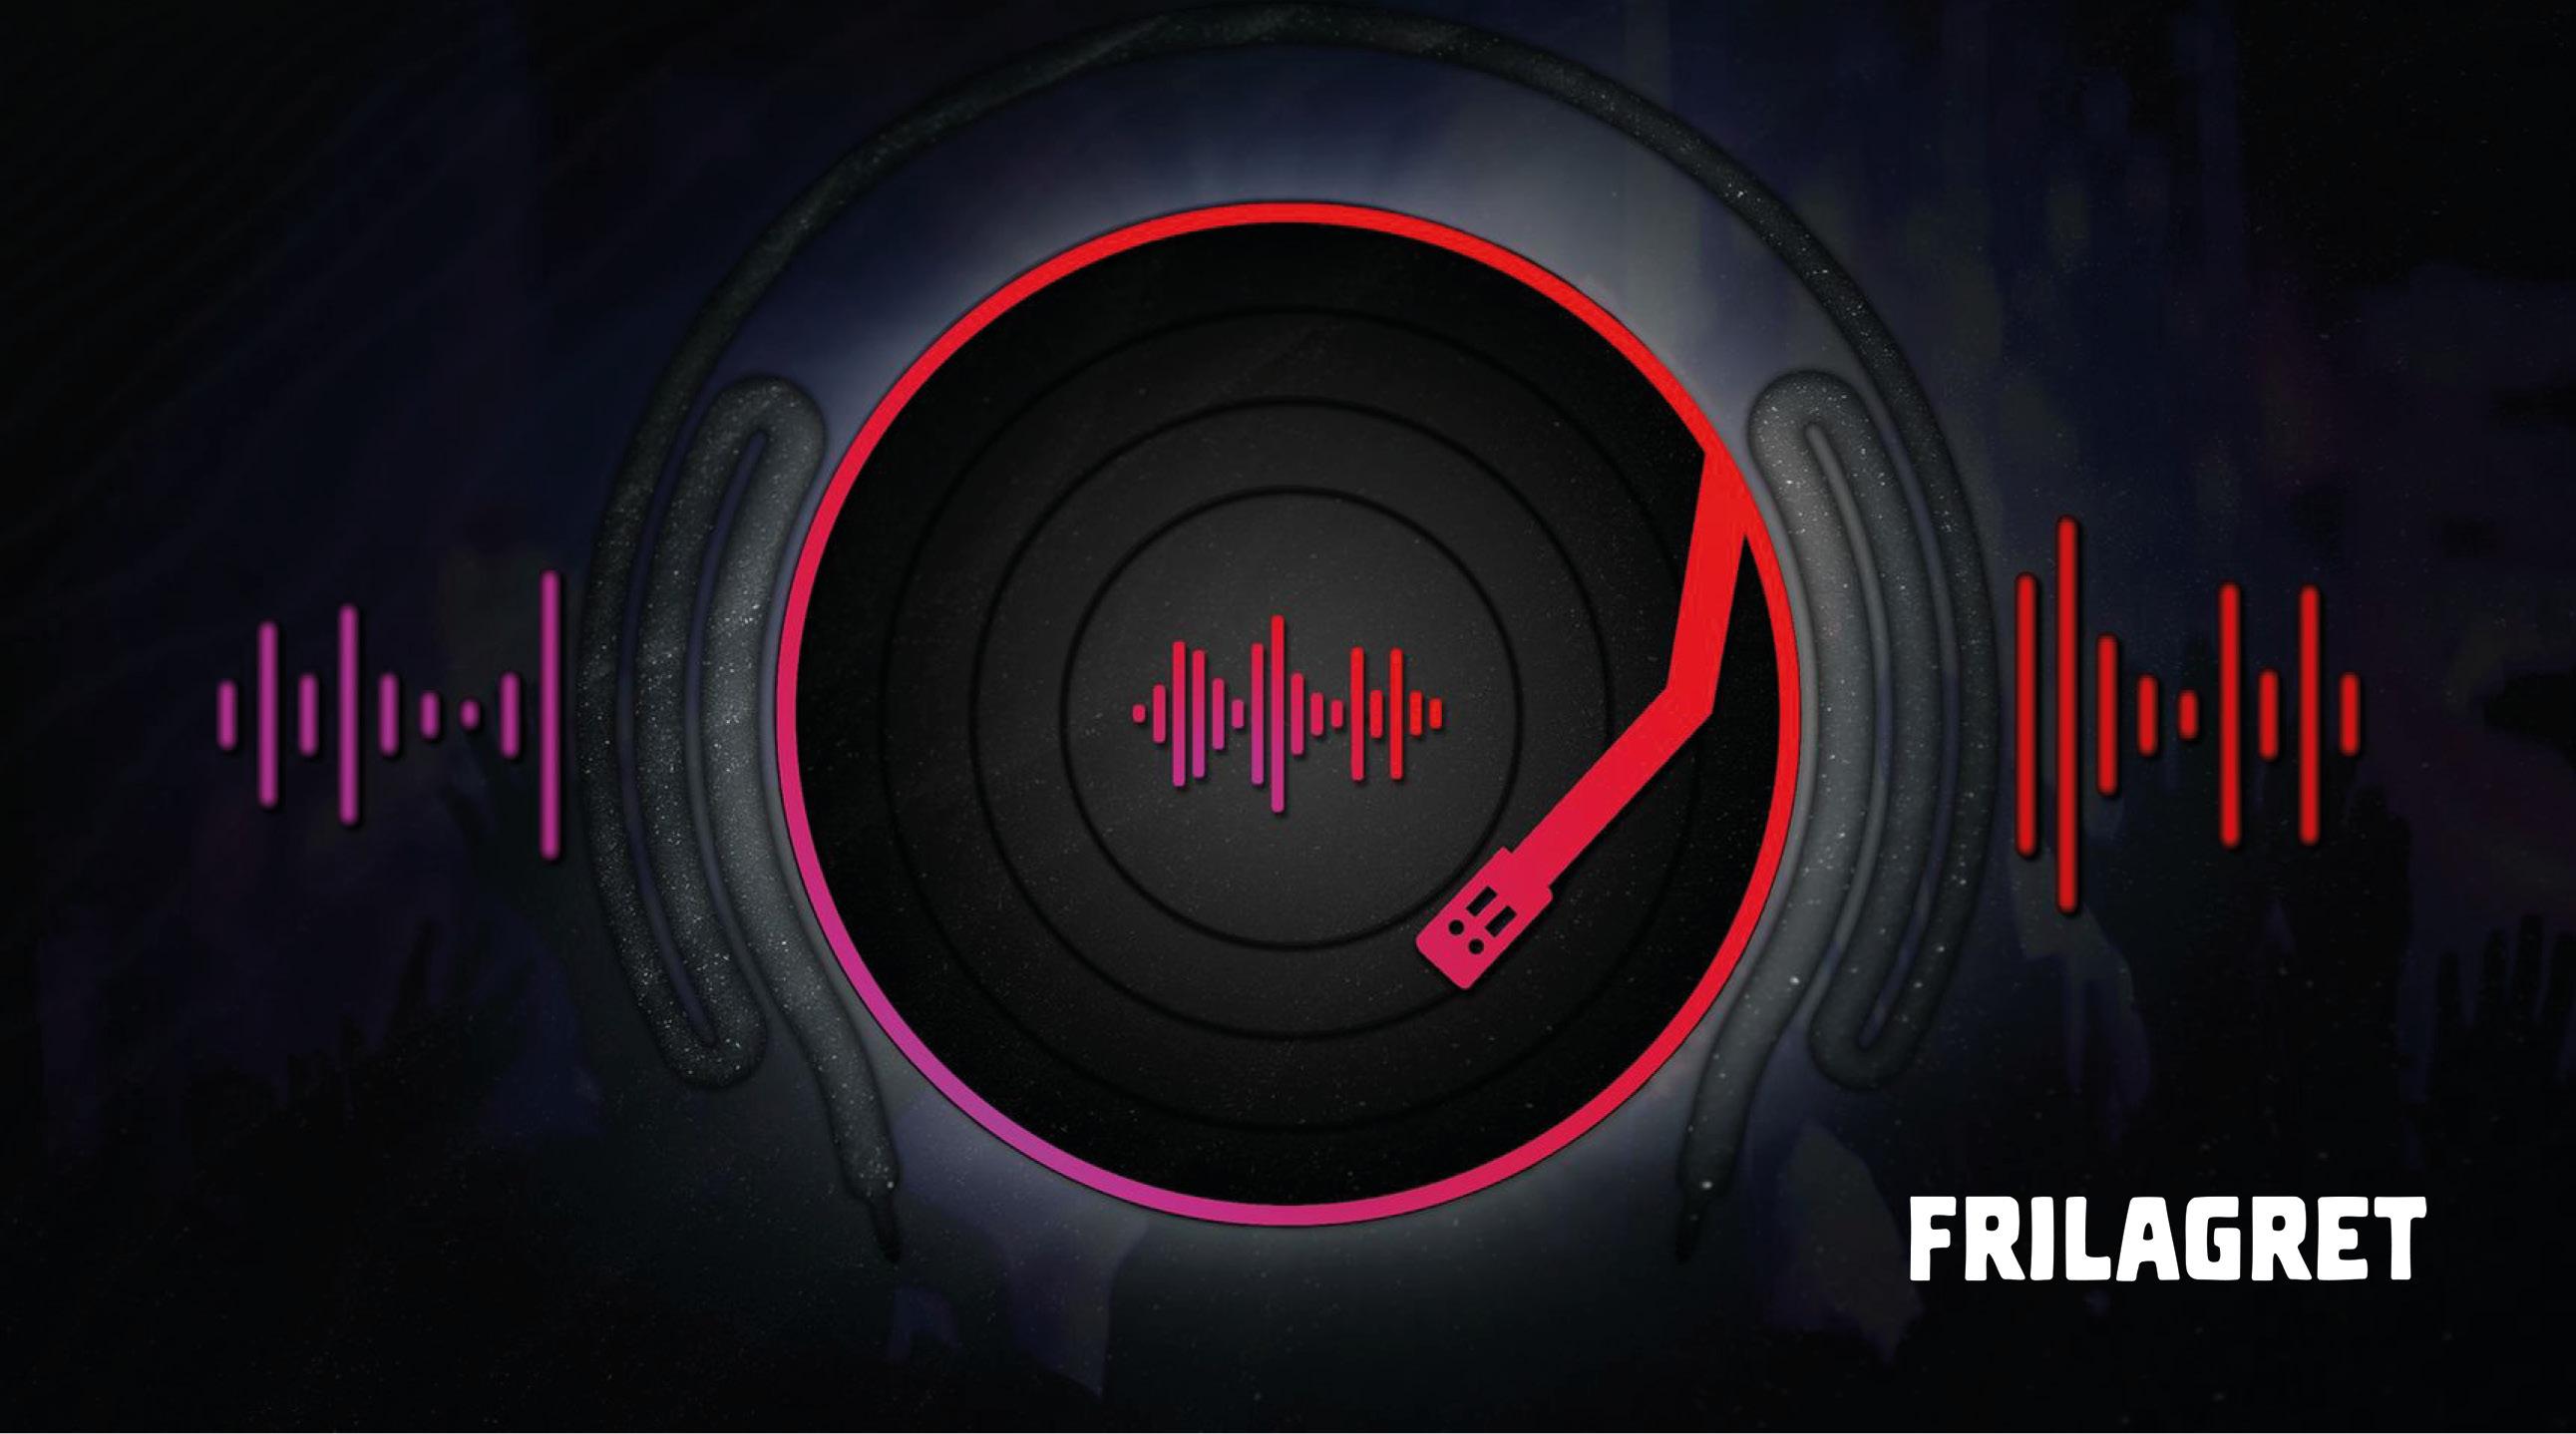 Digitalt: Saving tunes